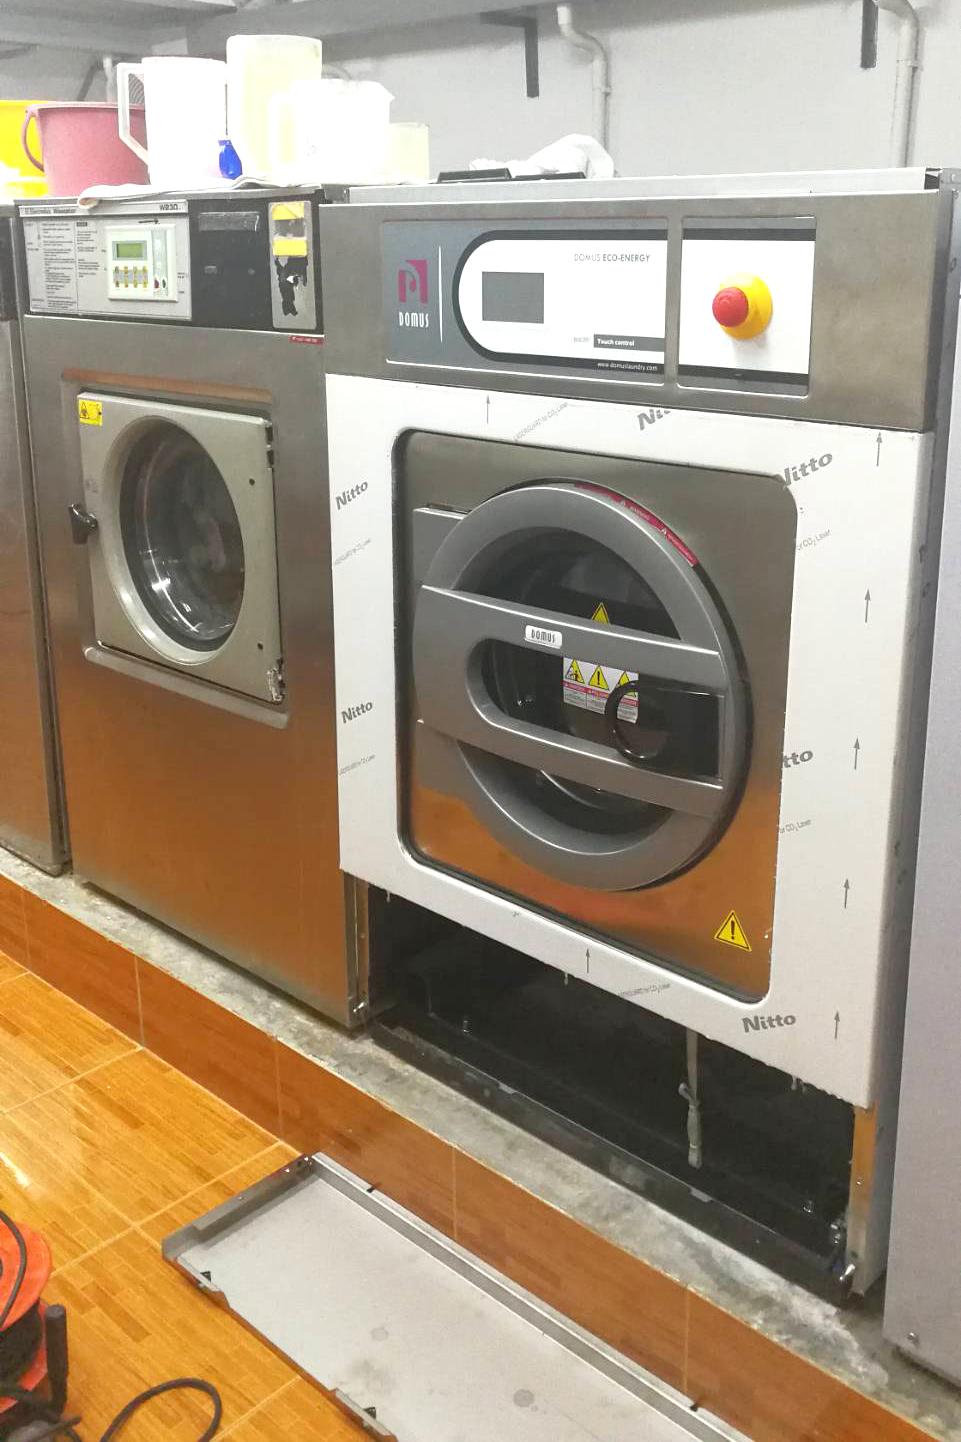 DOMUS, PRIMER, FAGOR, DANUBE, DLS, DMS, โดมุส, ขายเครื่องซักผ้าอุตสาหกรรม, เครื่องซักสลัดผ้าอุตสาหกรรม, เครื่องซักผ้าโรงแรม, เครื่องซักผ้าโรงพยาบาล, เครื่องซักผ้าโรงงาน, เครื่องซักผ้ายุโรป, เครื่องซักผ้าราคาถูก, เครื่องซักผ้าลอนดรี้, washer extractor, rig